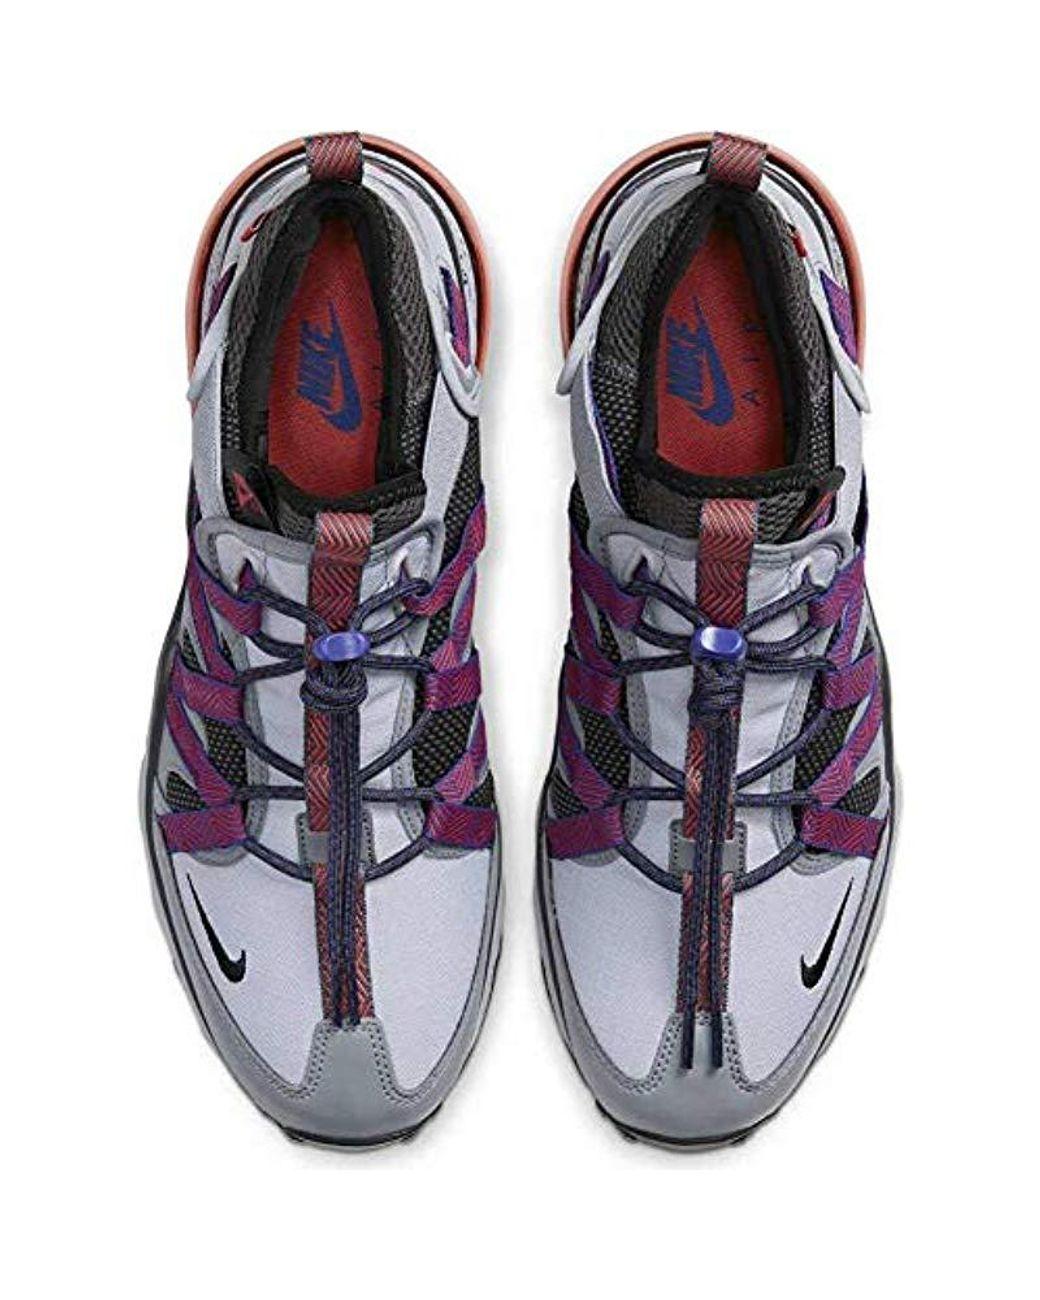 Nike Air Max 270 Bowfin Trainers Grey